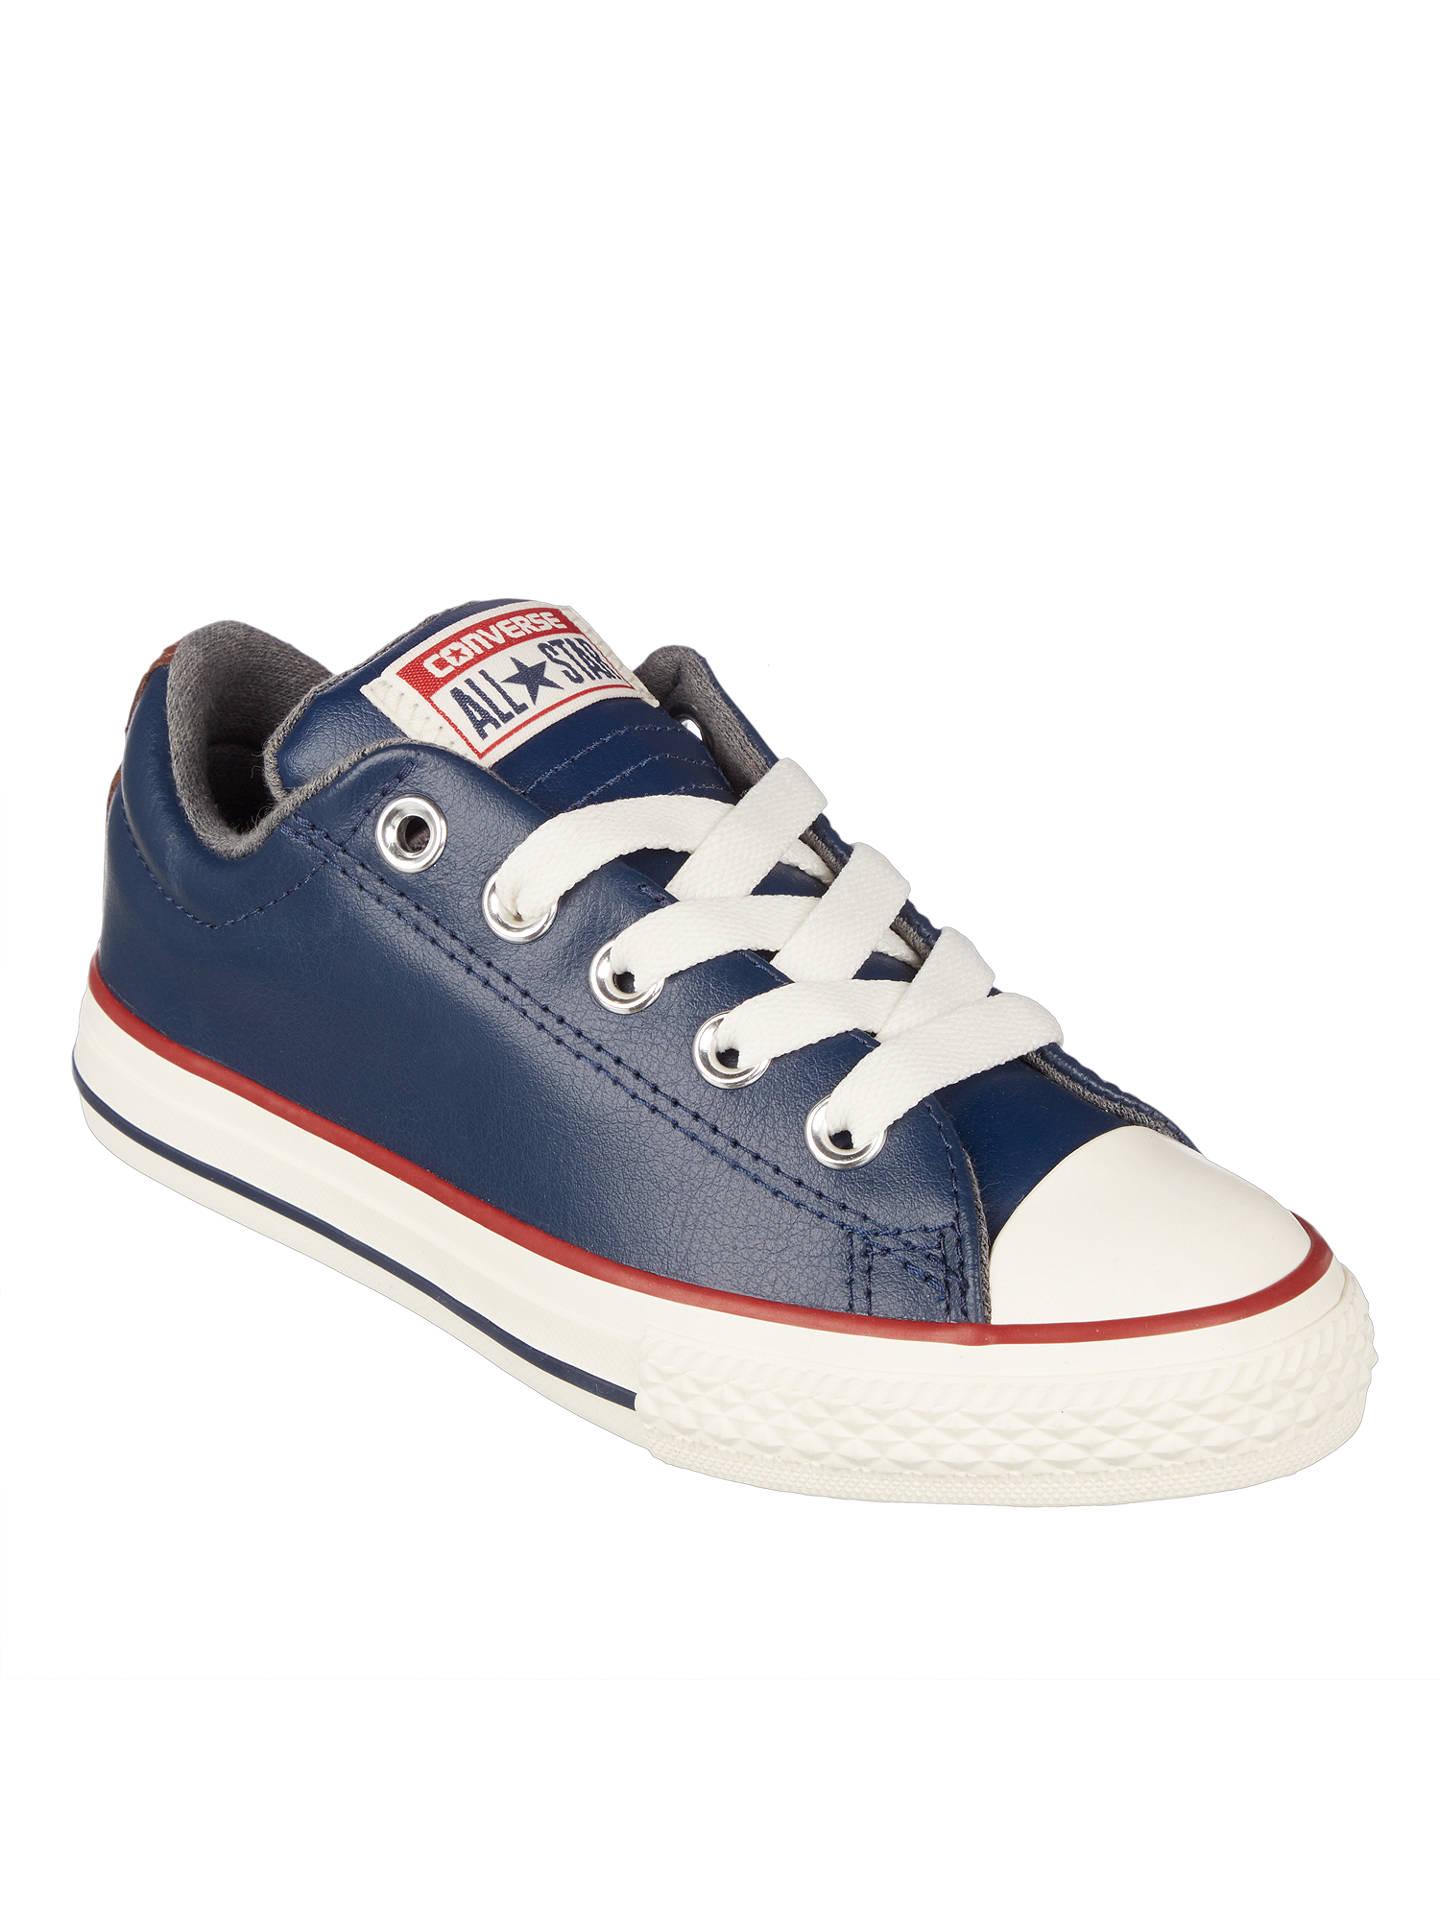 converse shoes john lewis